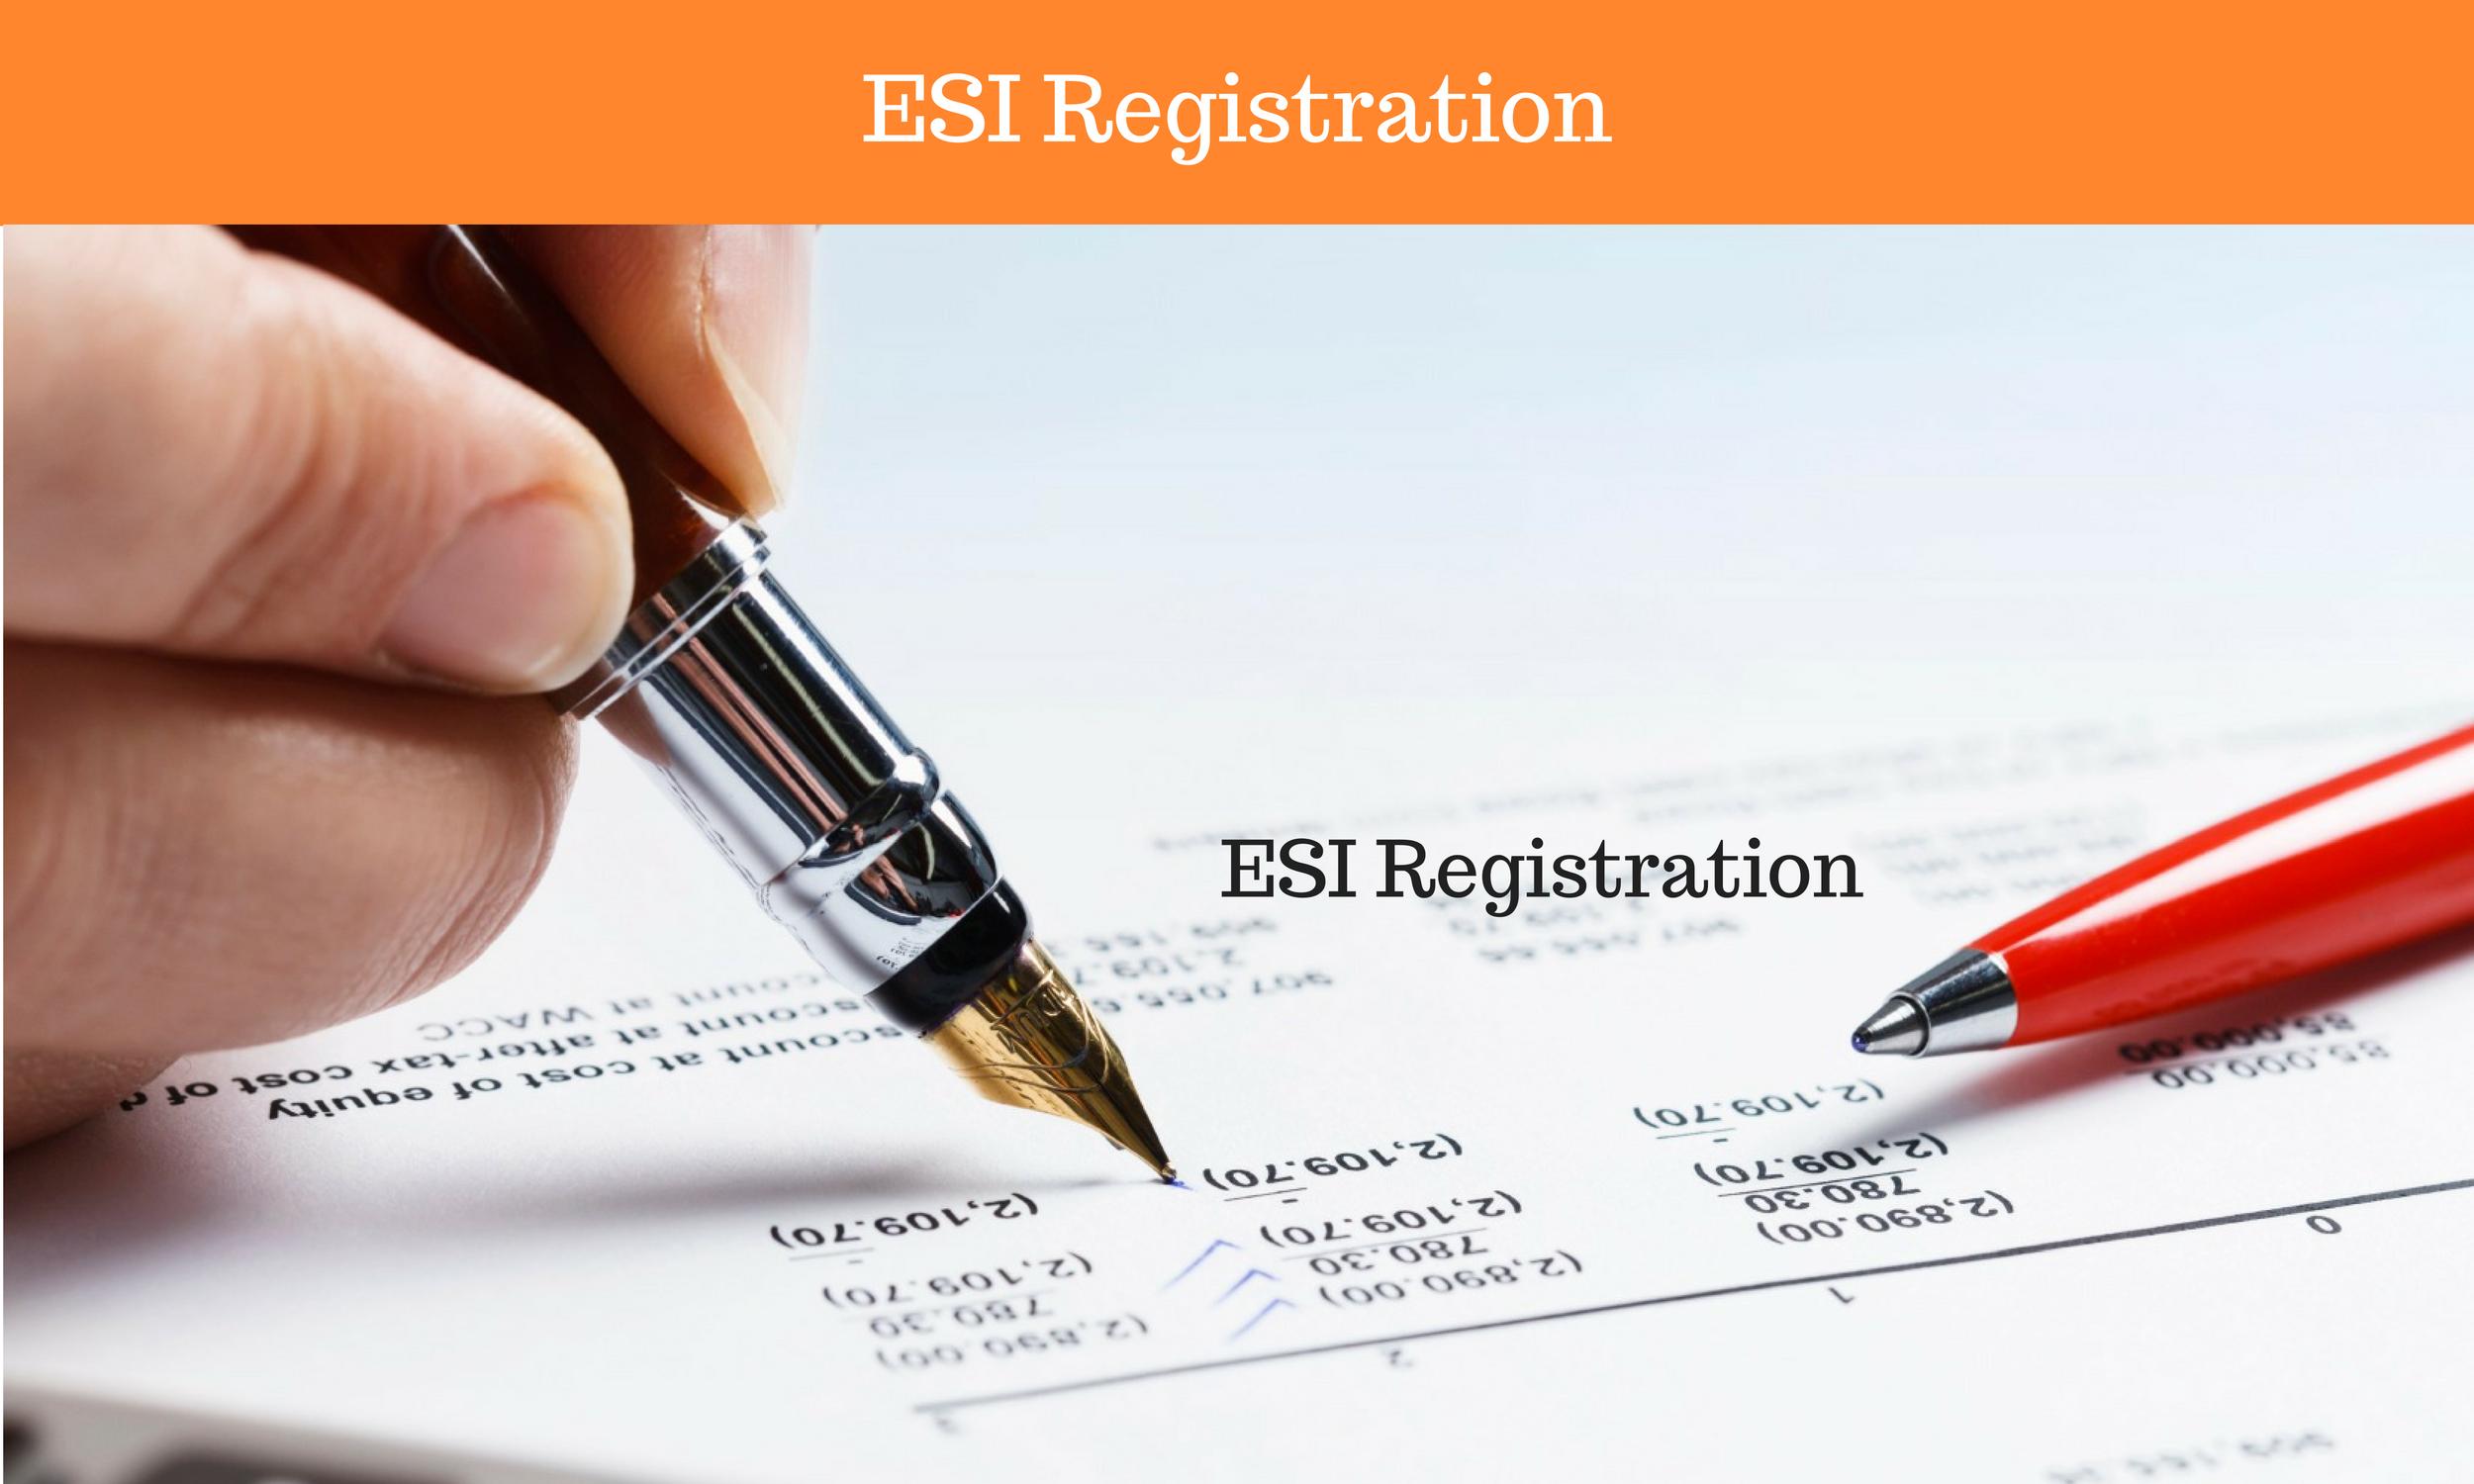 ESI Registration